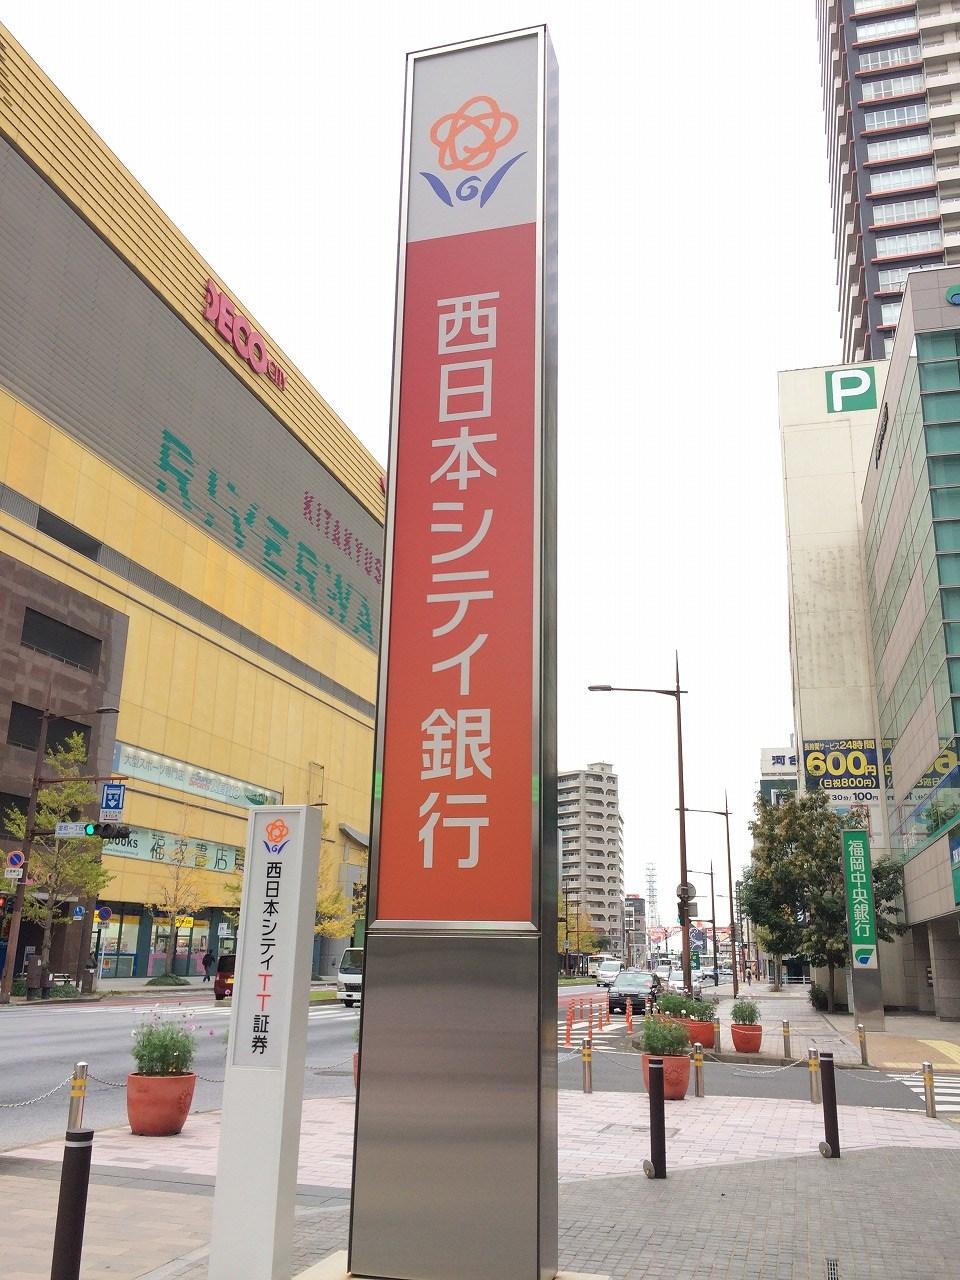 銀行:西日本シティ銀行 穴生 874m